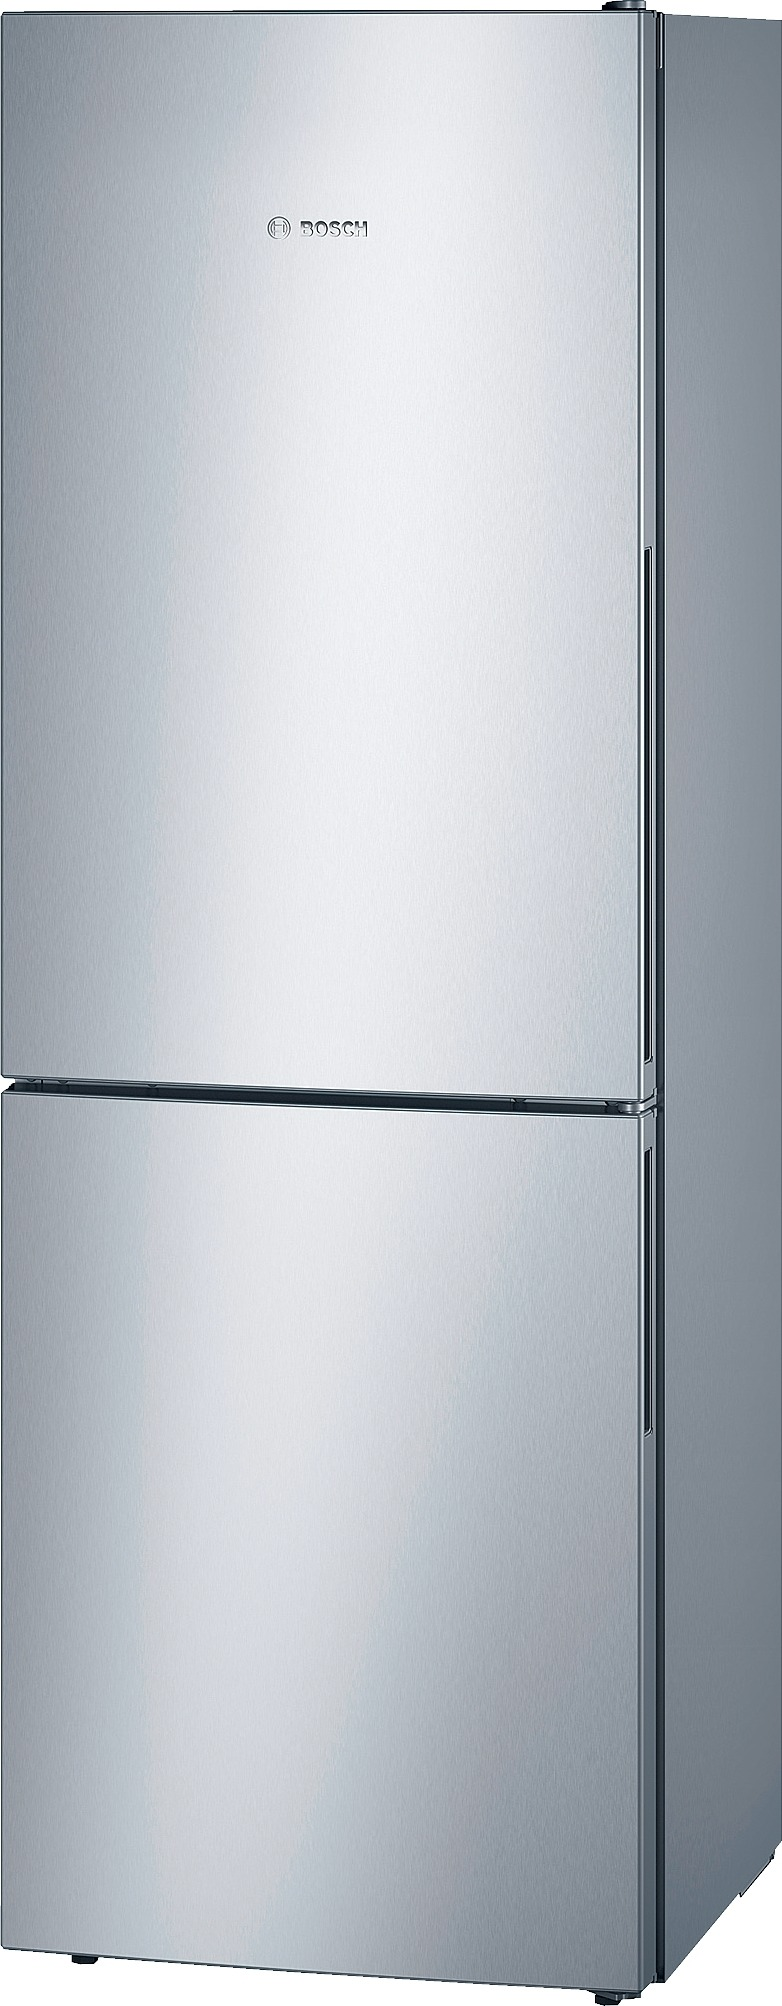 Bosch koelkast met vriesvak KGV33VL31